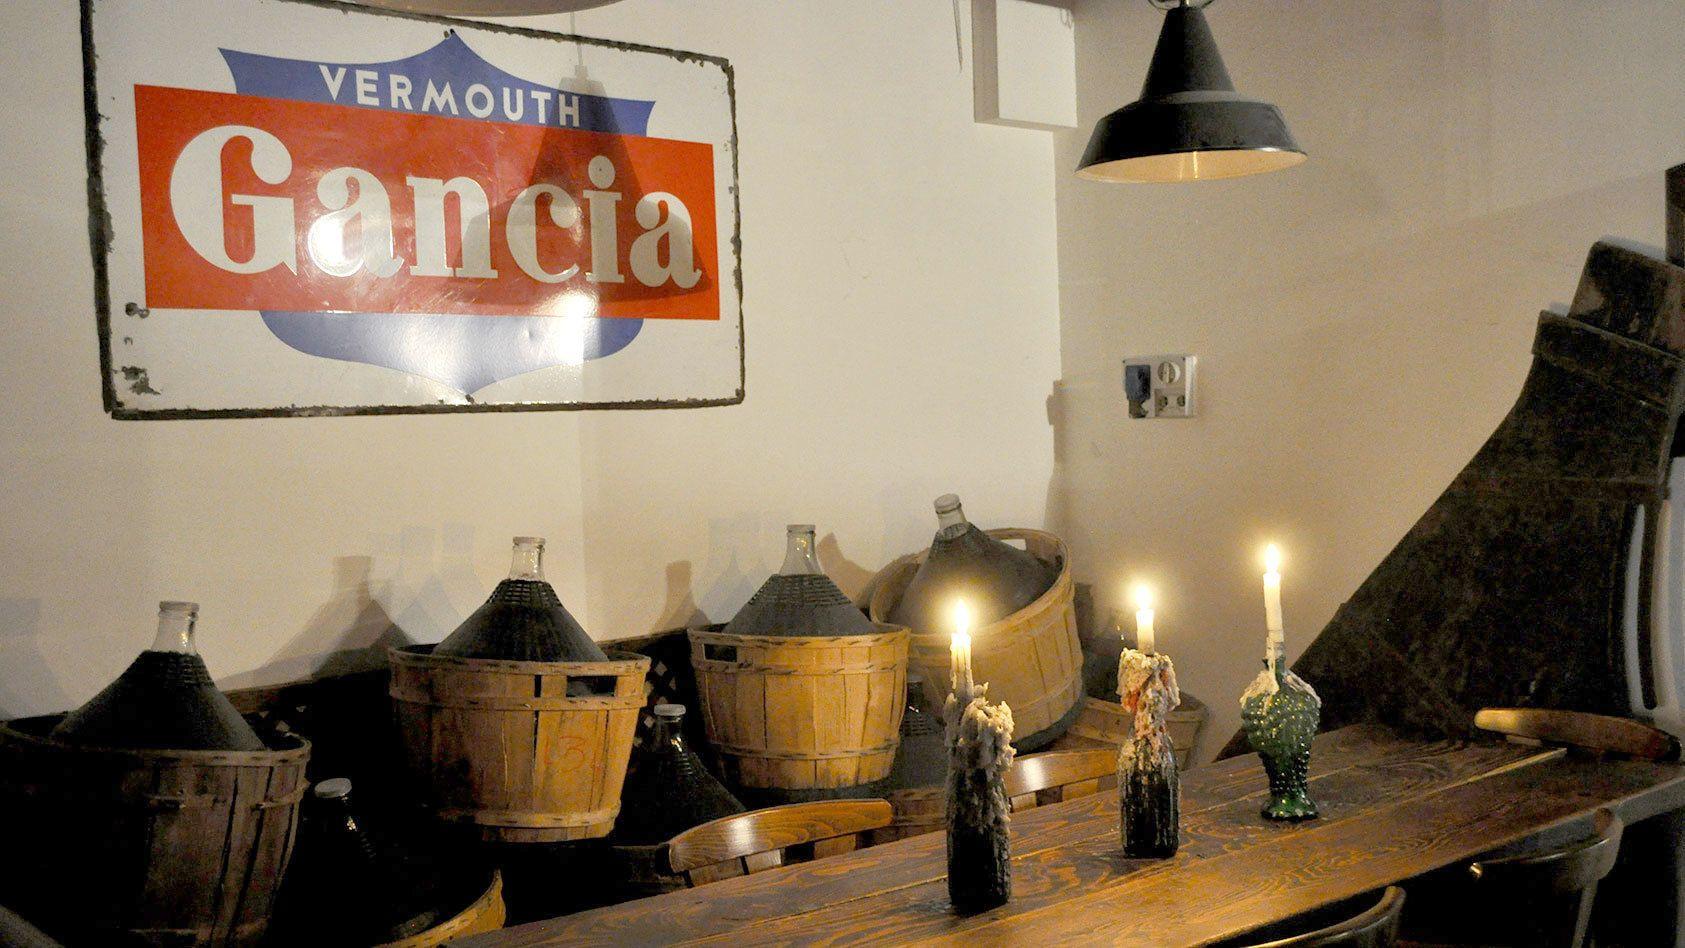 Bottles of wine in baskets in Venice Italy